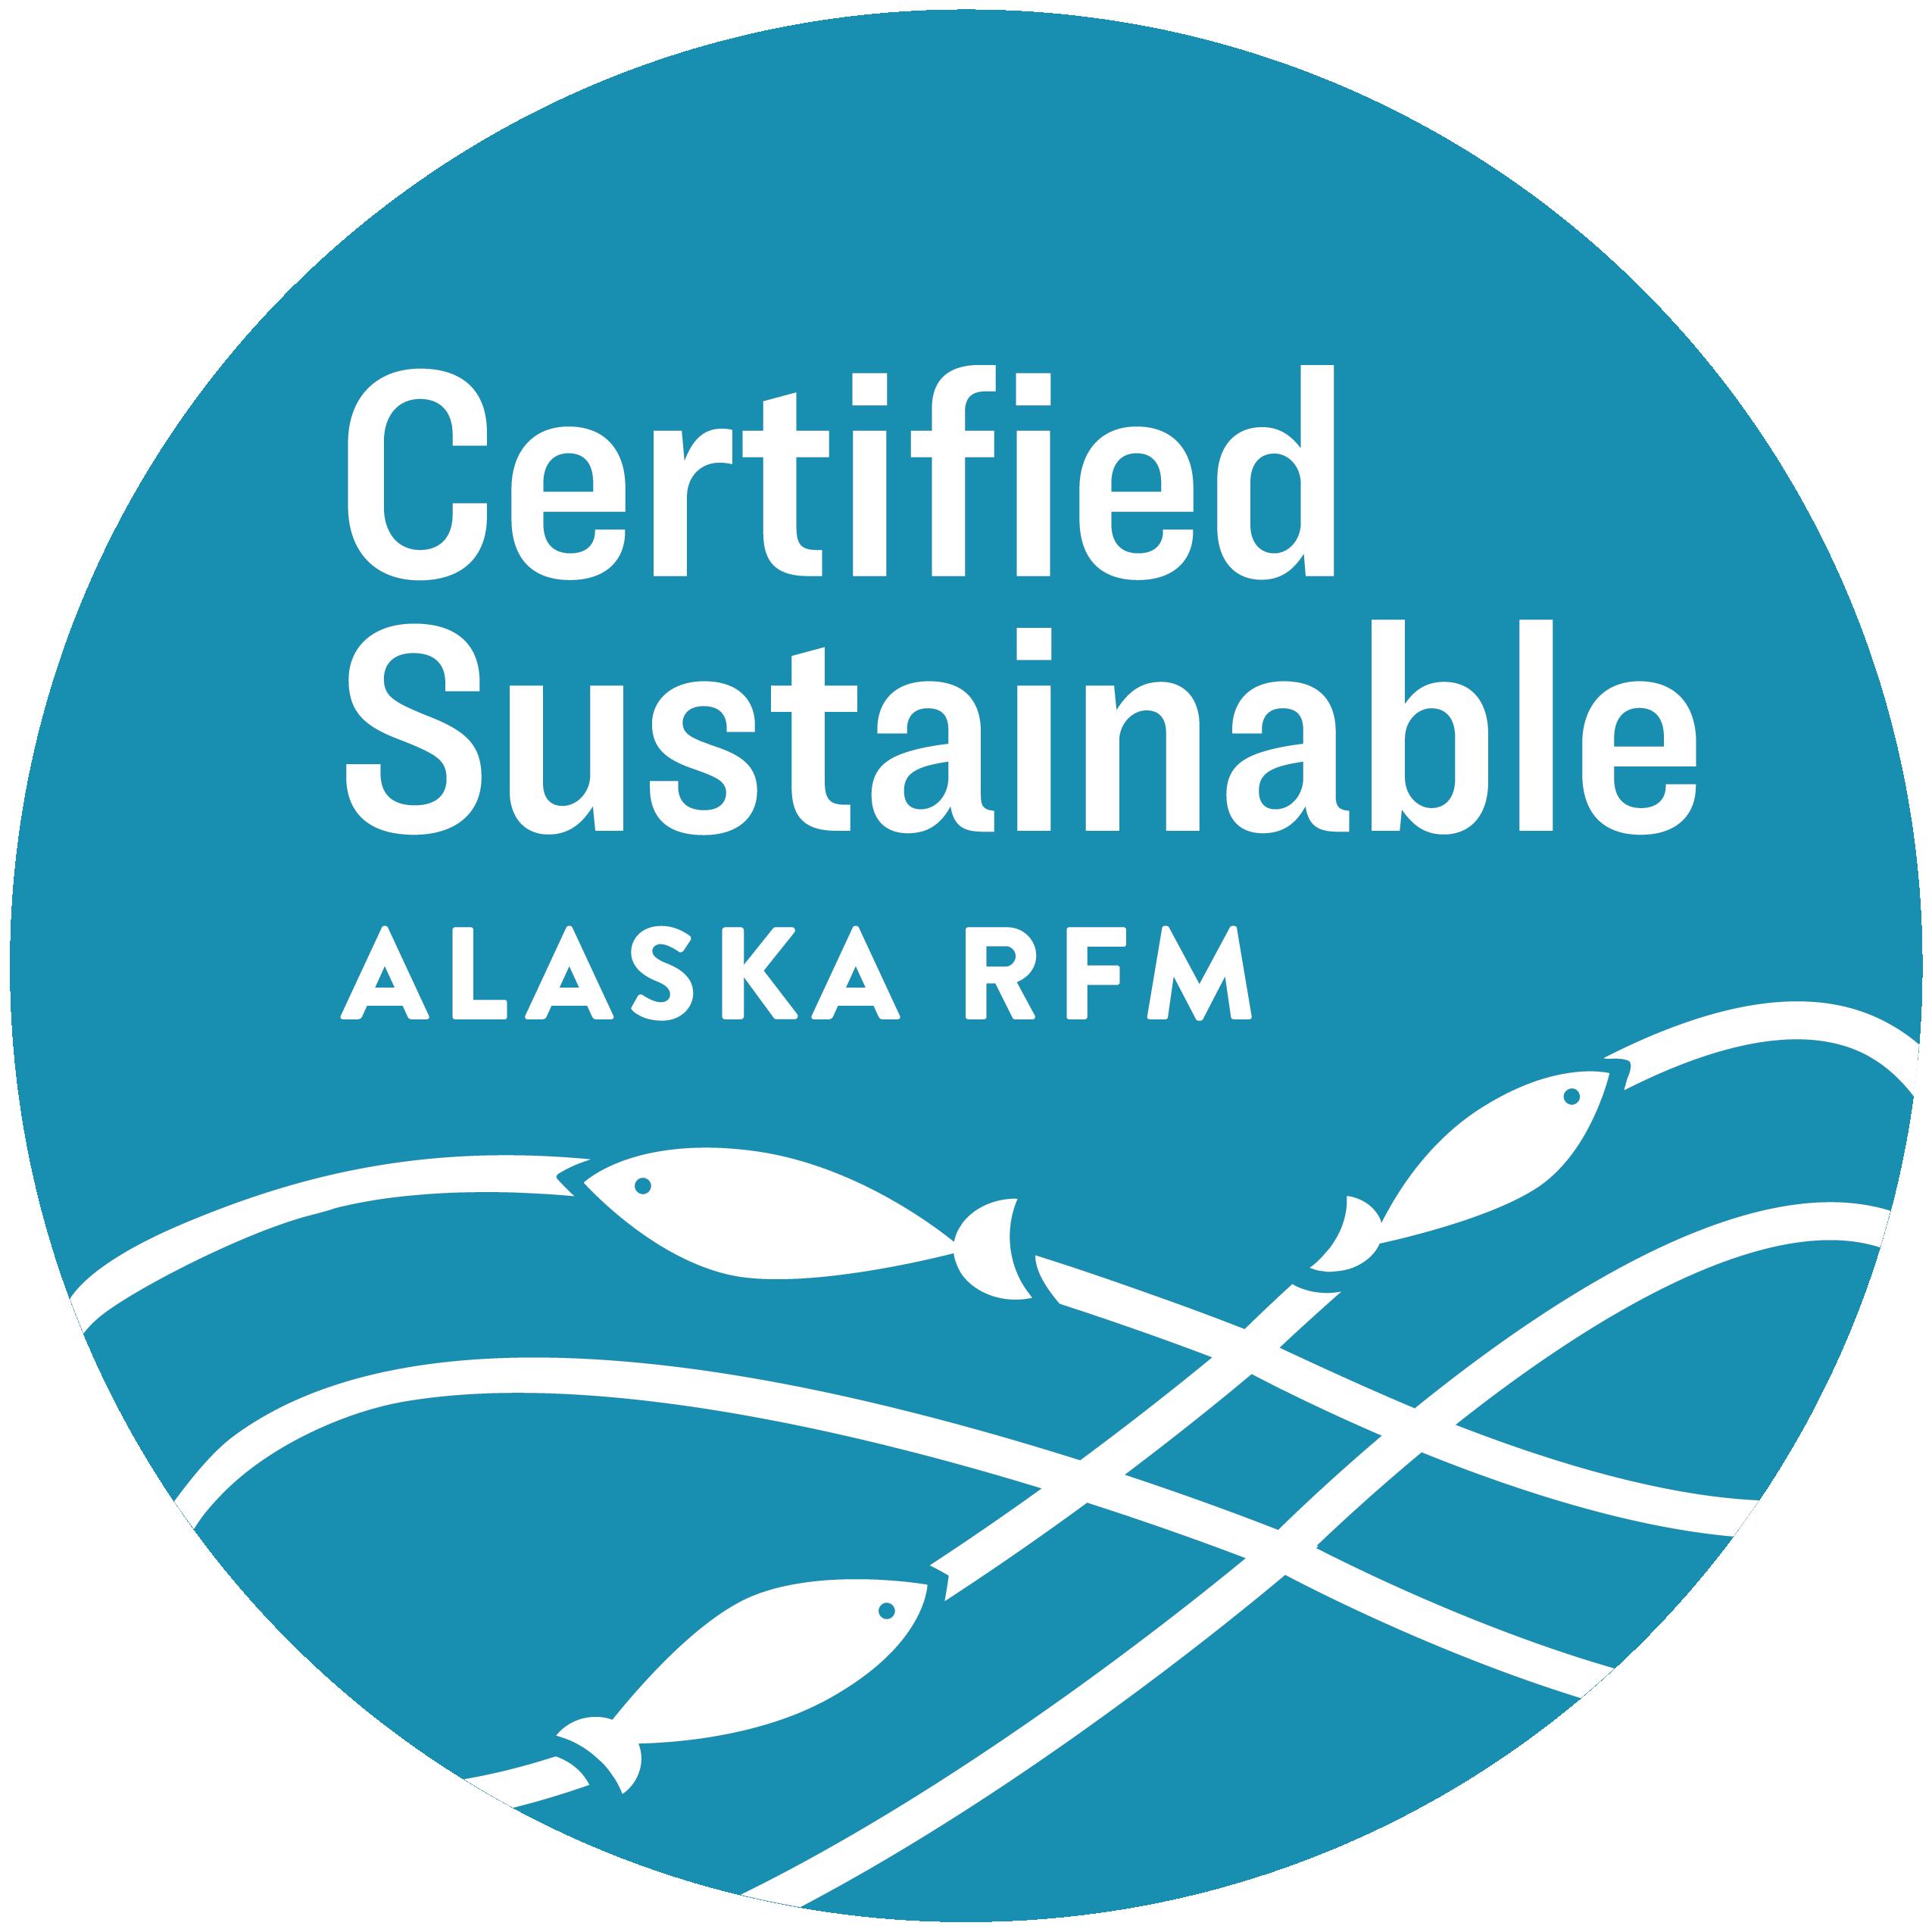 Certified Sustainable Alaska RFM Logo